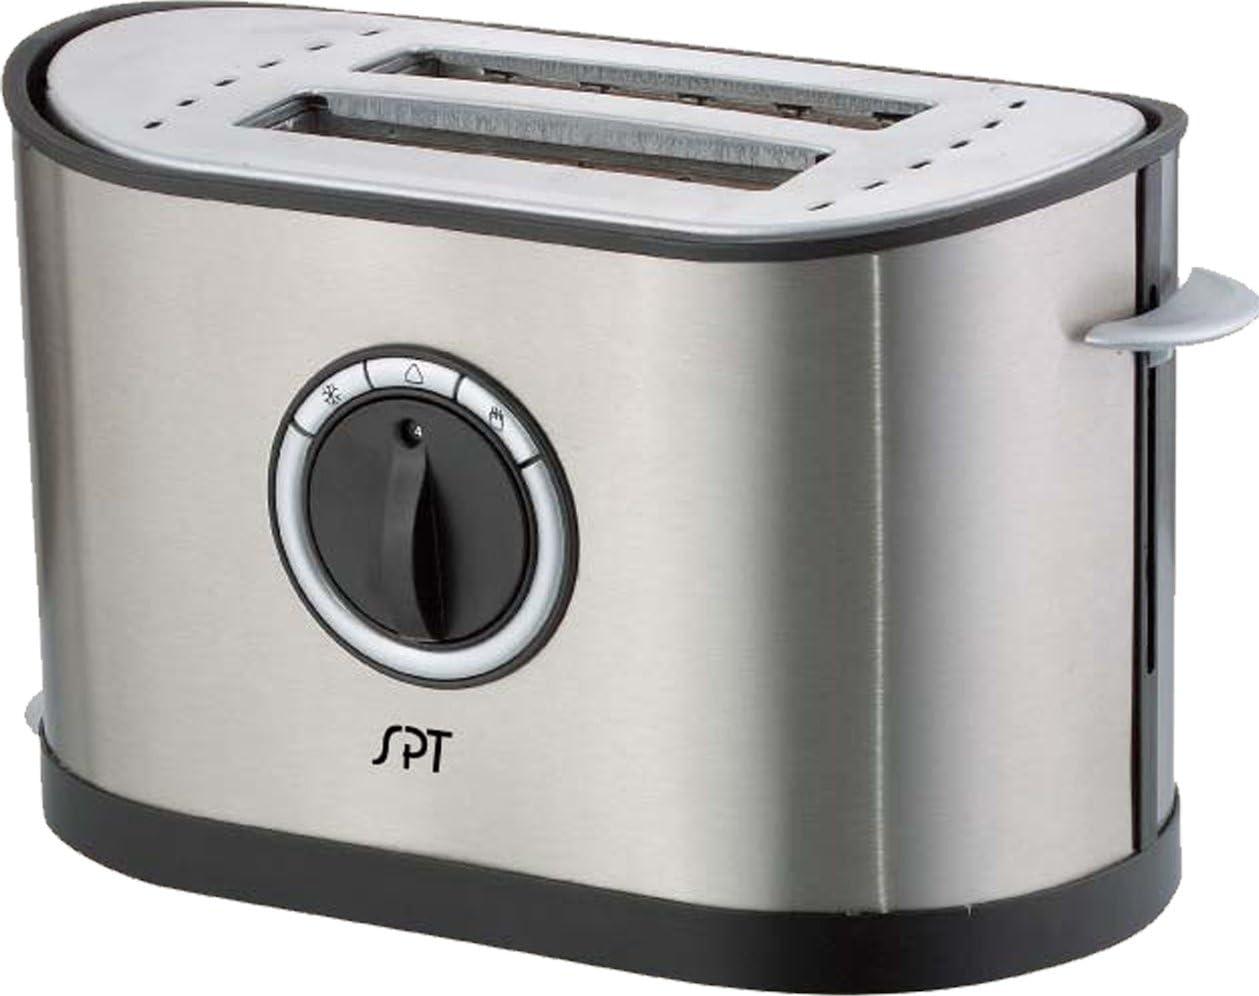 2-slot Stainless Steel Toaster